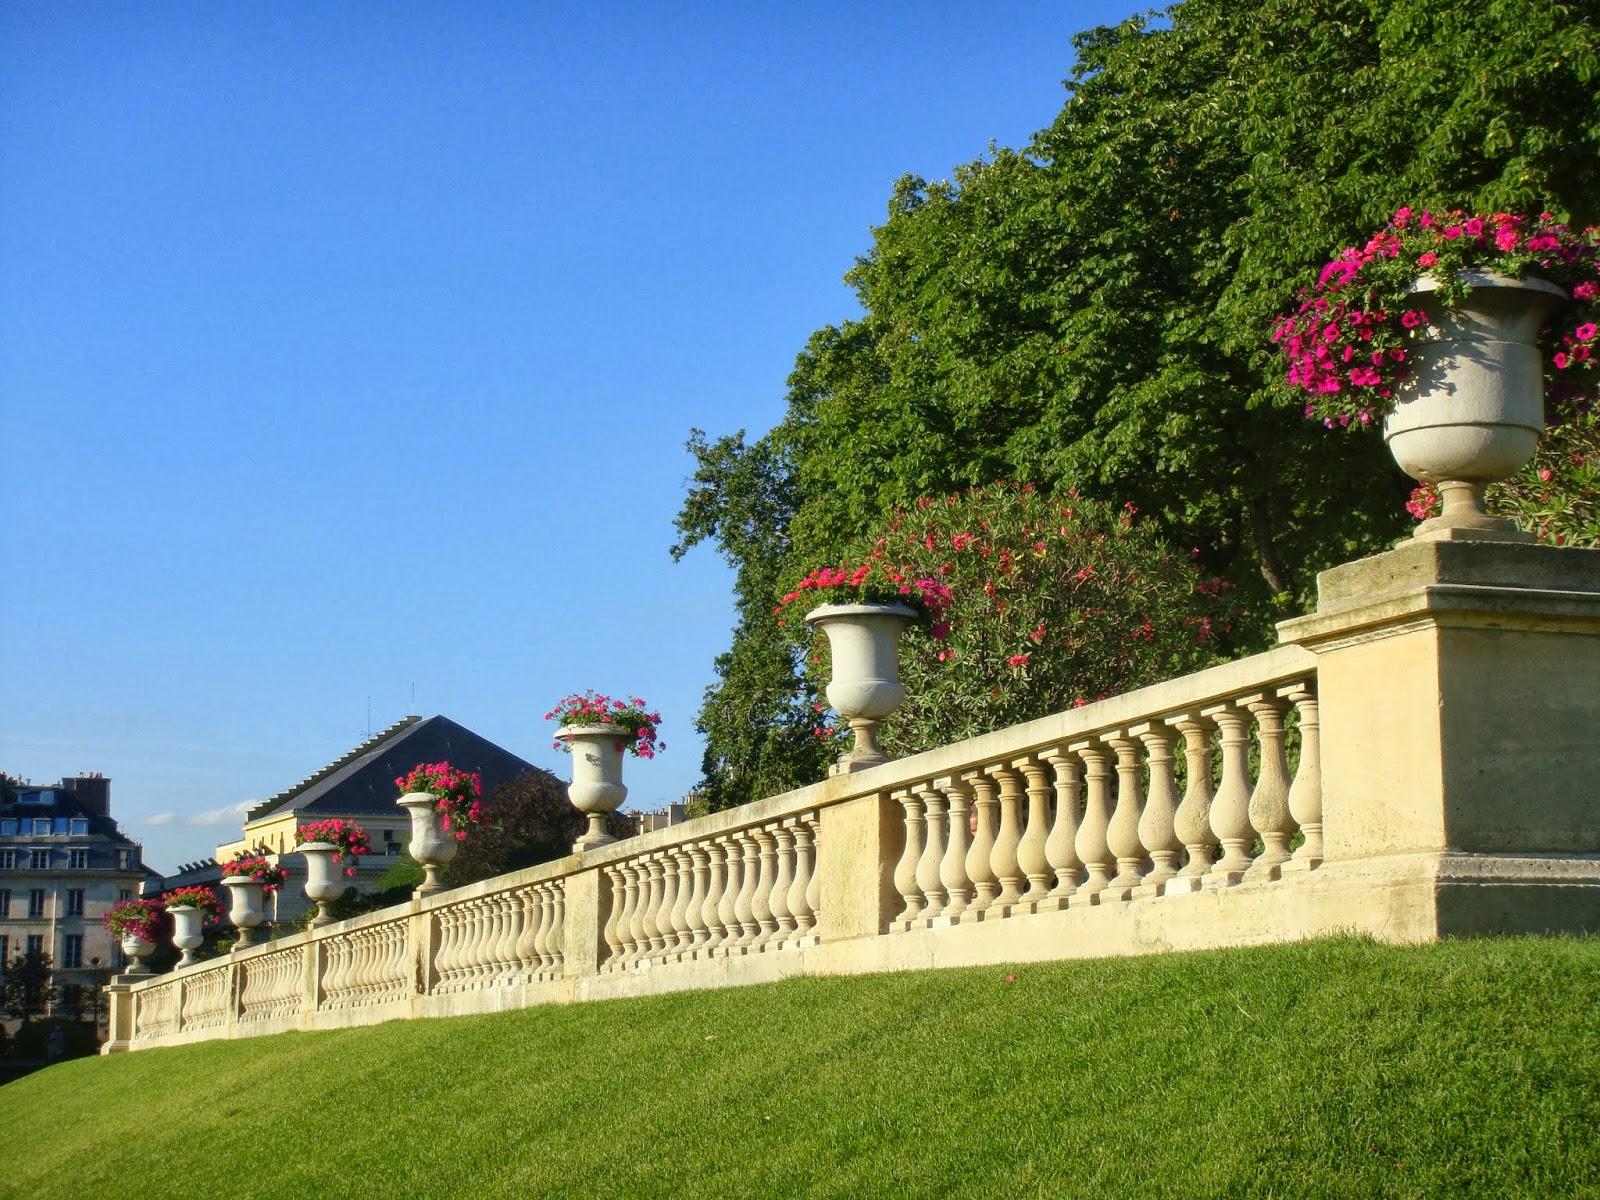 Jardines de Luxemburgo, Luco, París, Elisa N, Blog de Viajes, Lifestyle, Travel